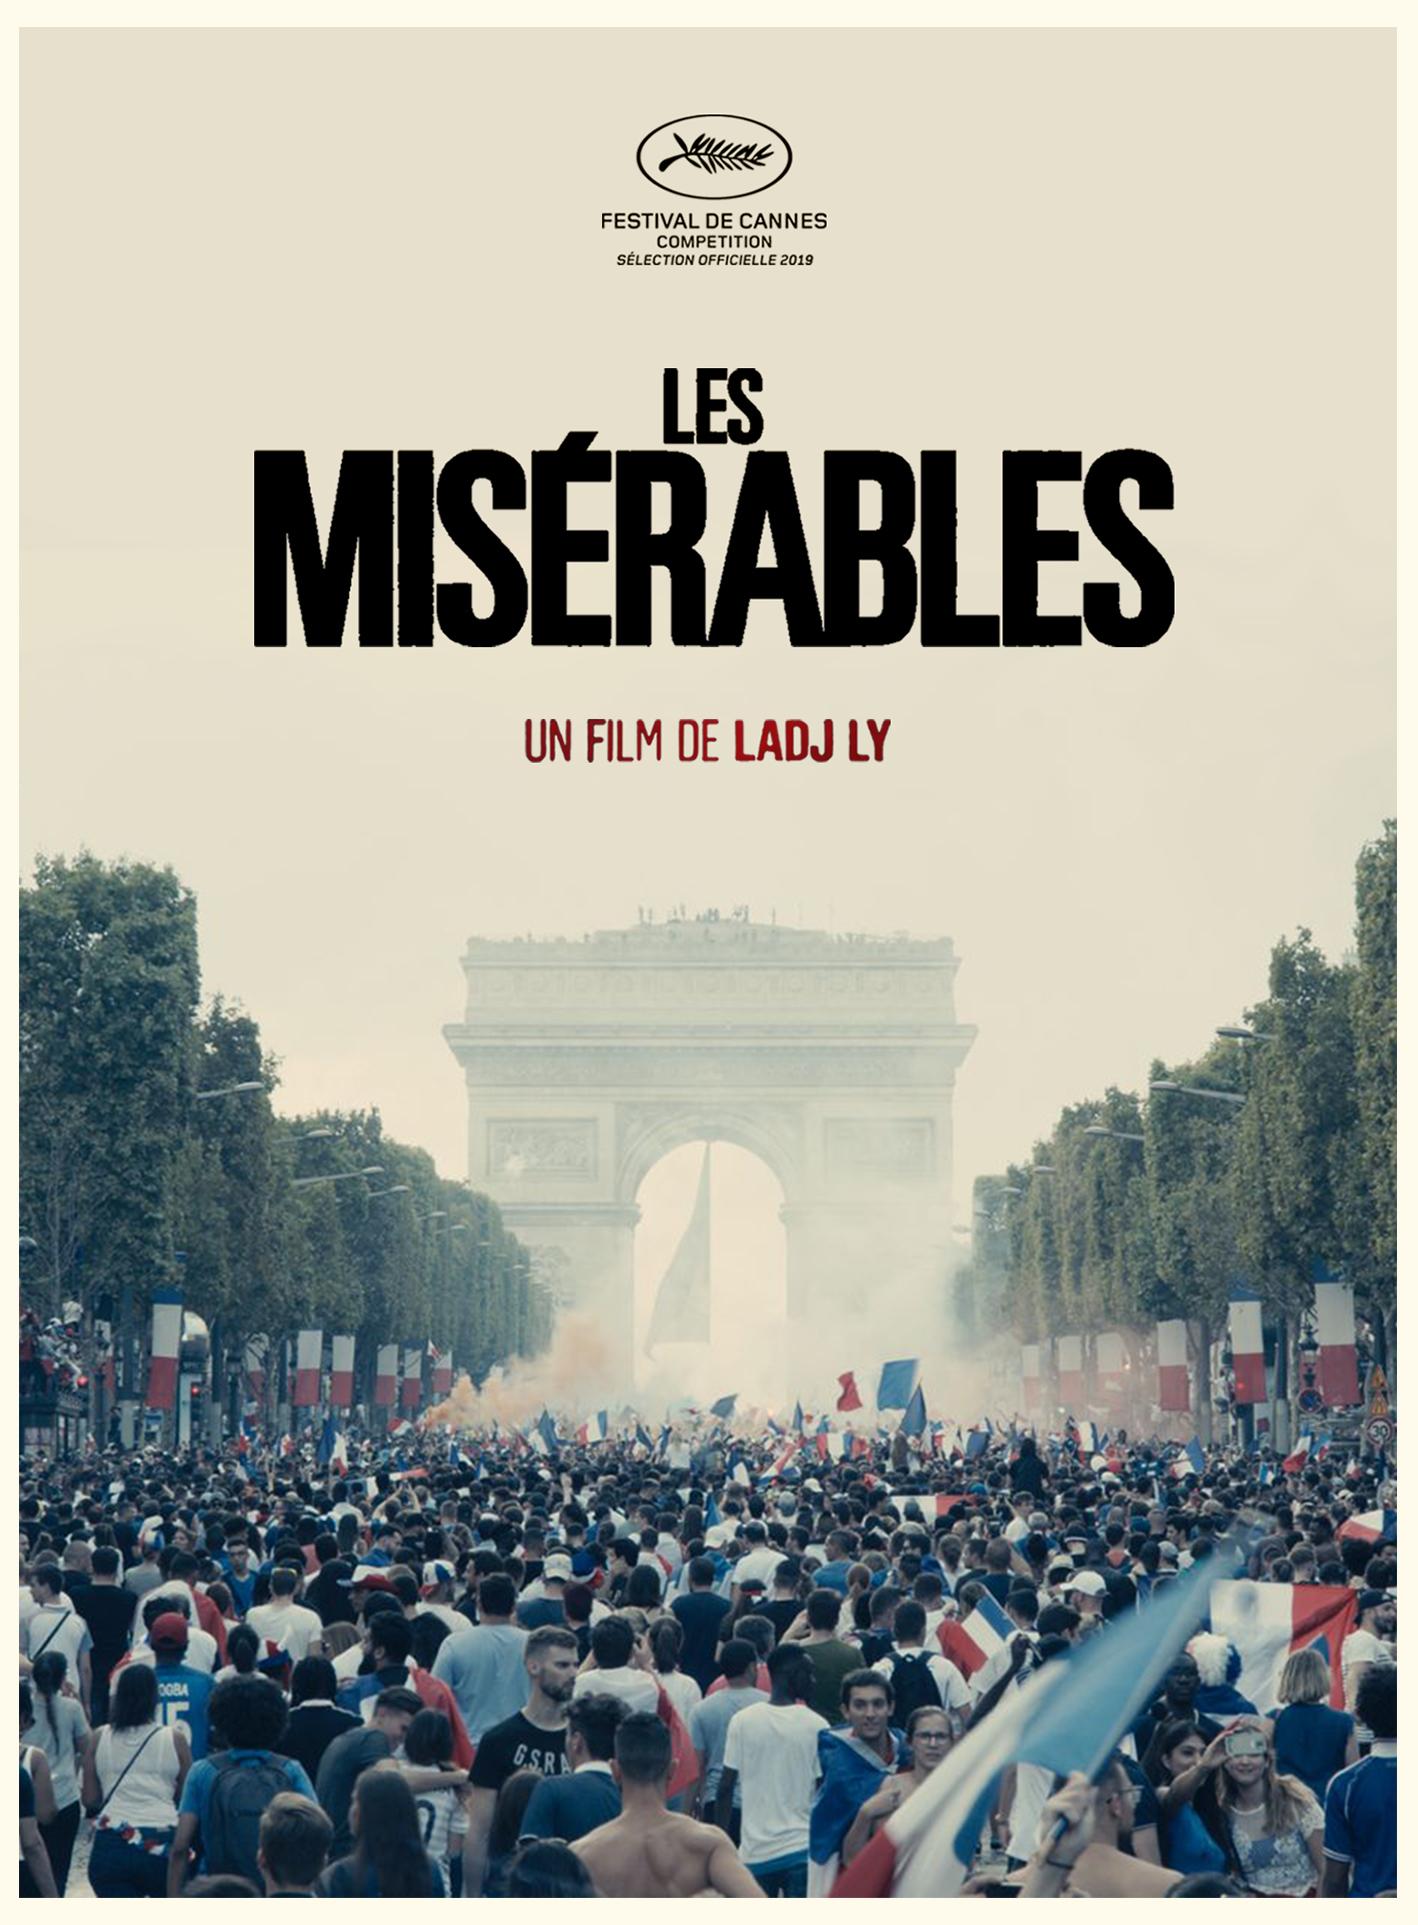 Les misérables (2019) - IMDb